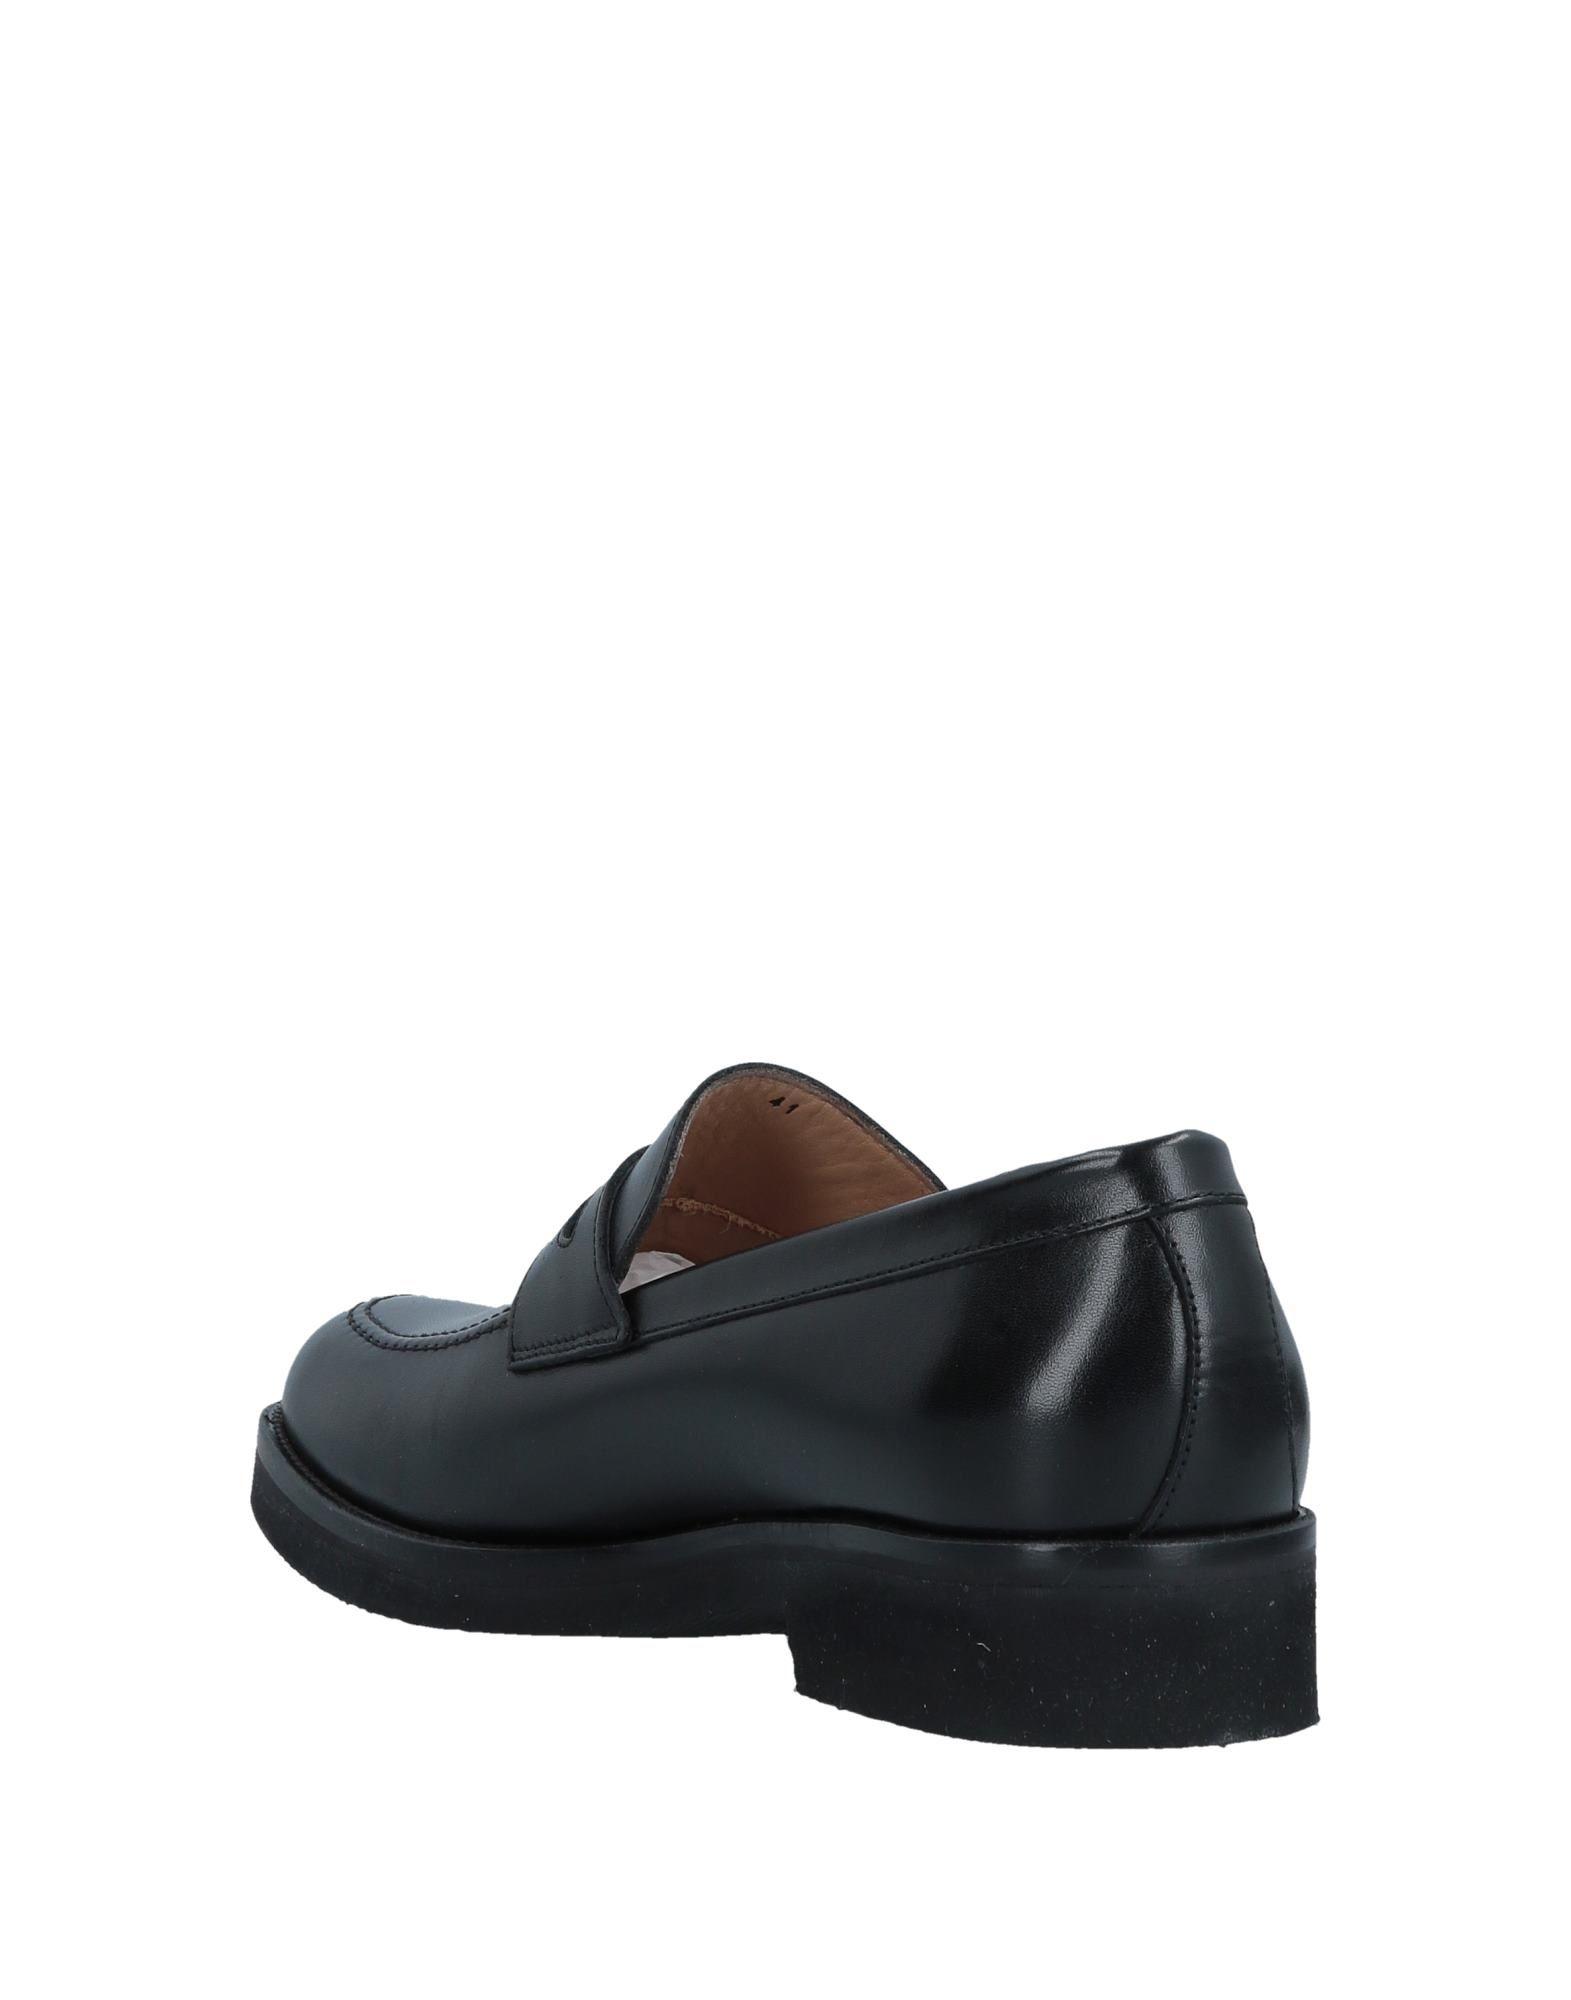 Stilvolle billige Schuhe Settantatre 11516185EB Lr Mokassins Damen  11516185EB Settantatre 31781c